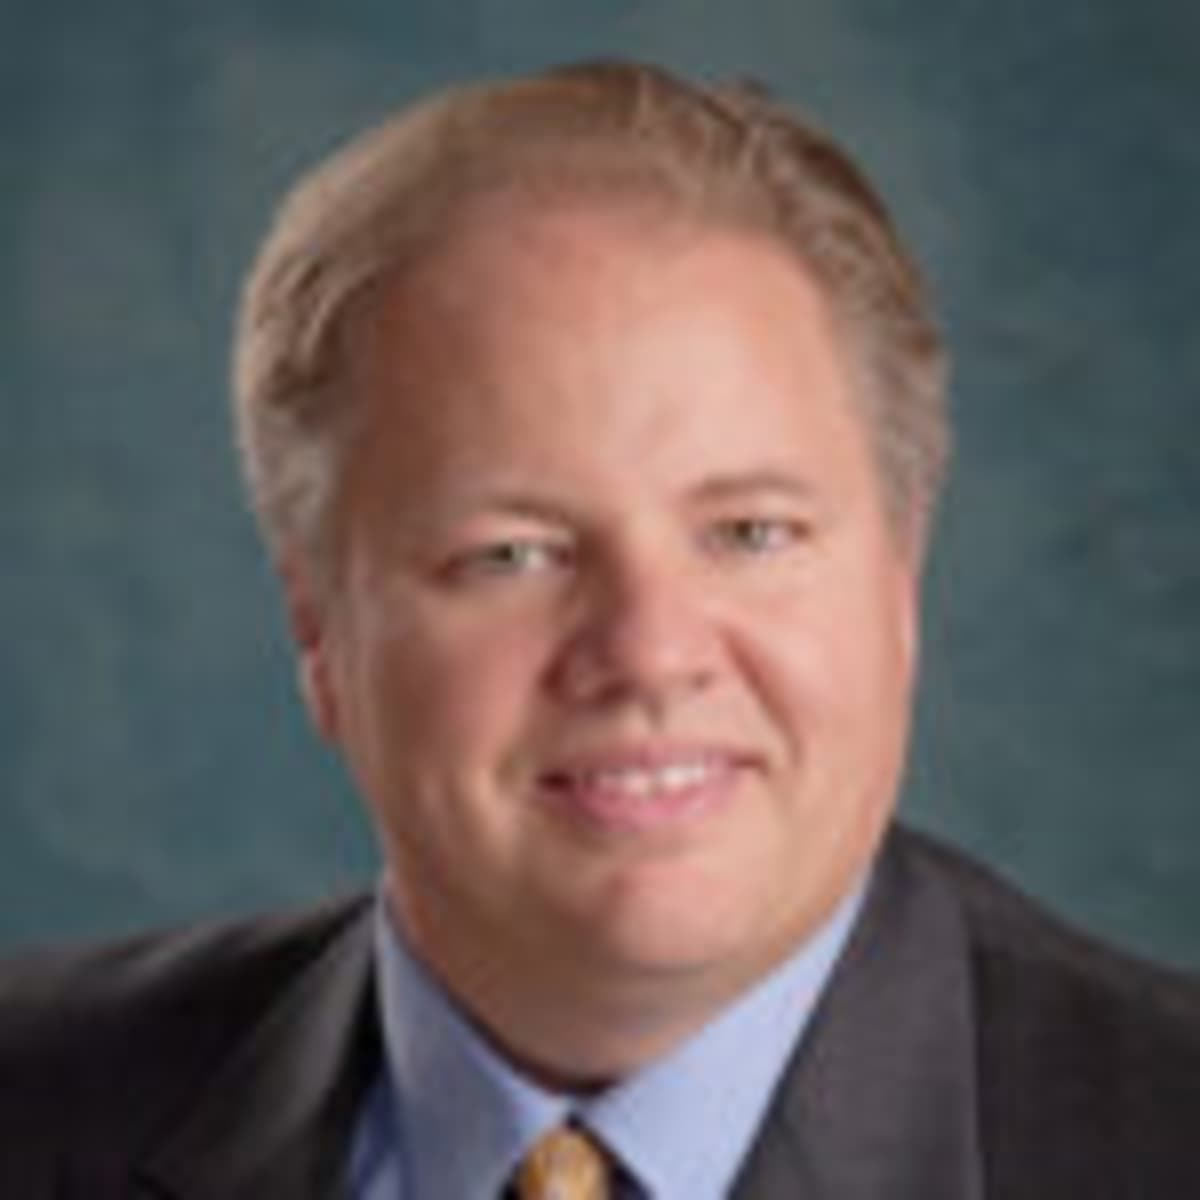 Video Dr Todd Orchard Md Lincoln Ne Plastic Surgeon